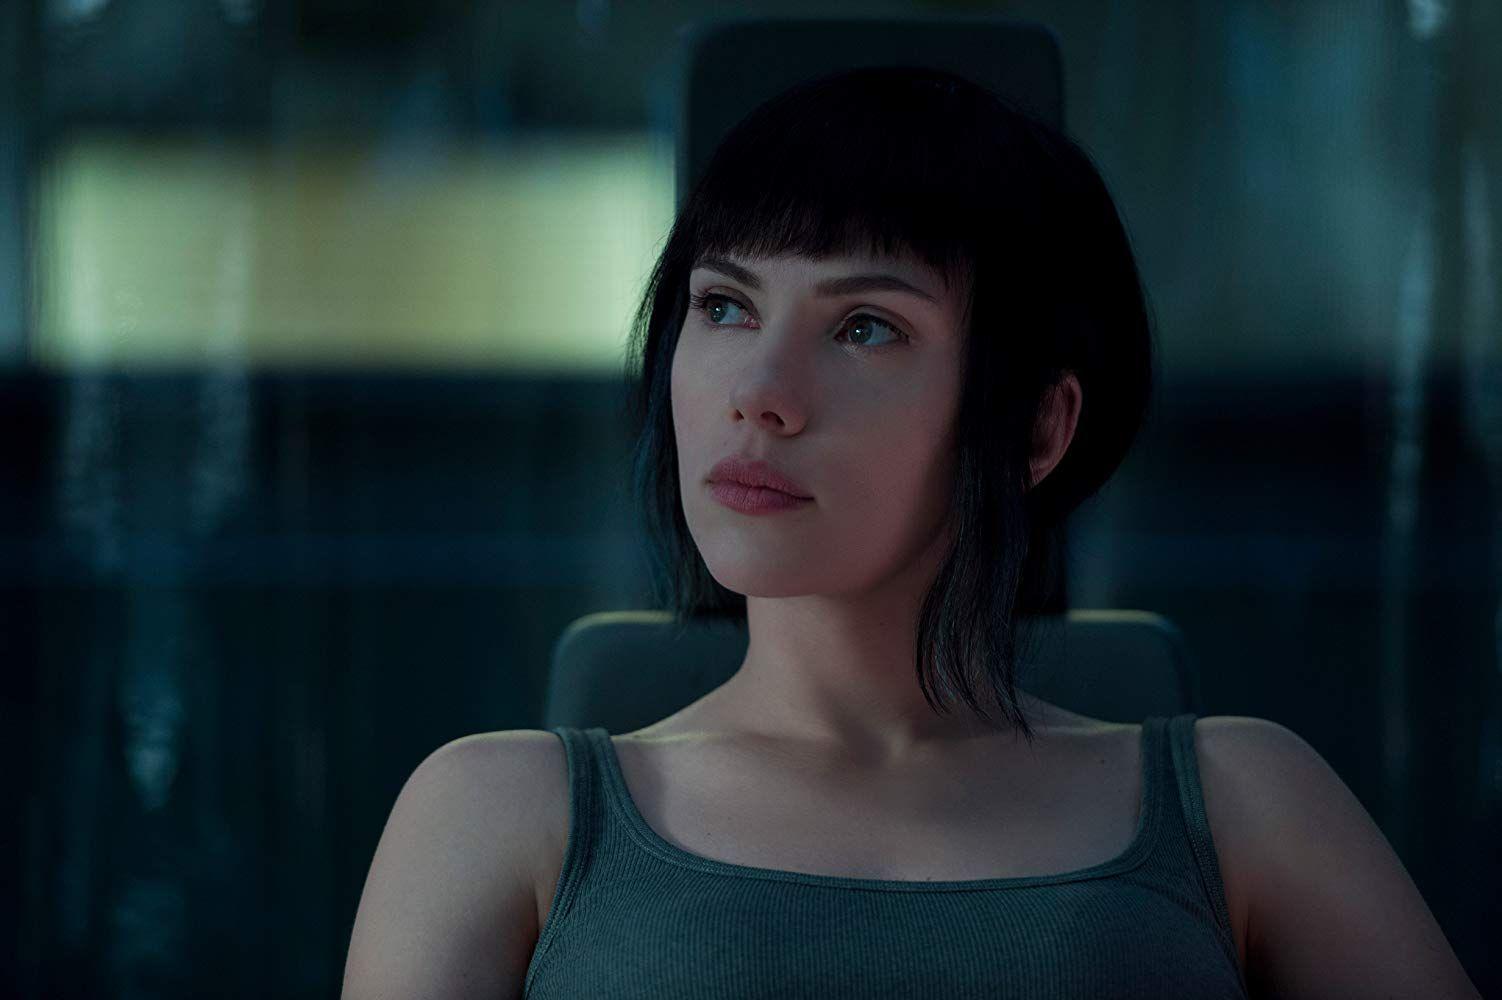 Scarlett Johansson In Ghost In The Shell 2017 Scarlett Johansson Ghost Scarlett Johansson Ghost In The Shell